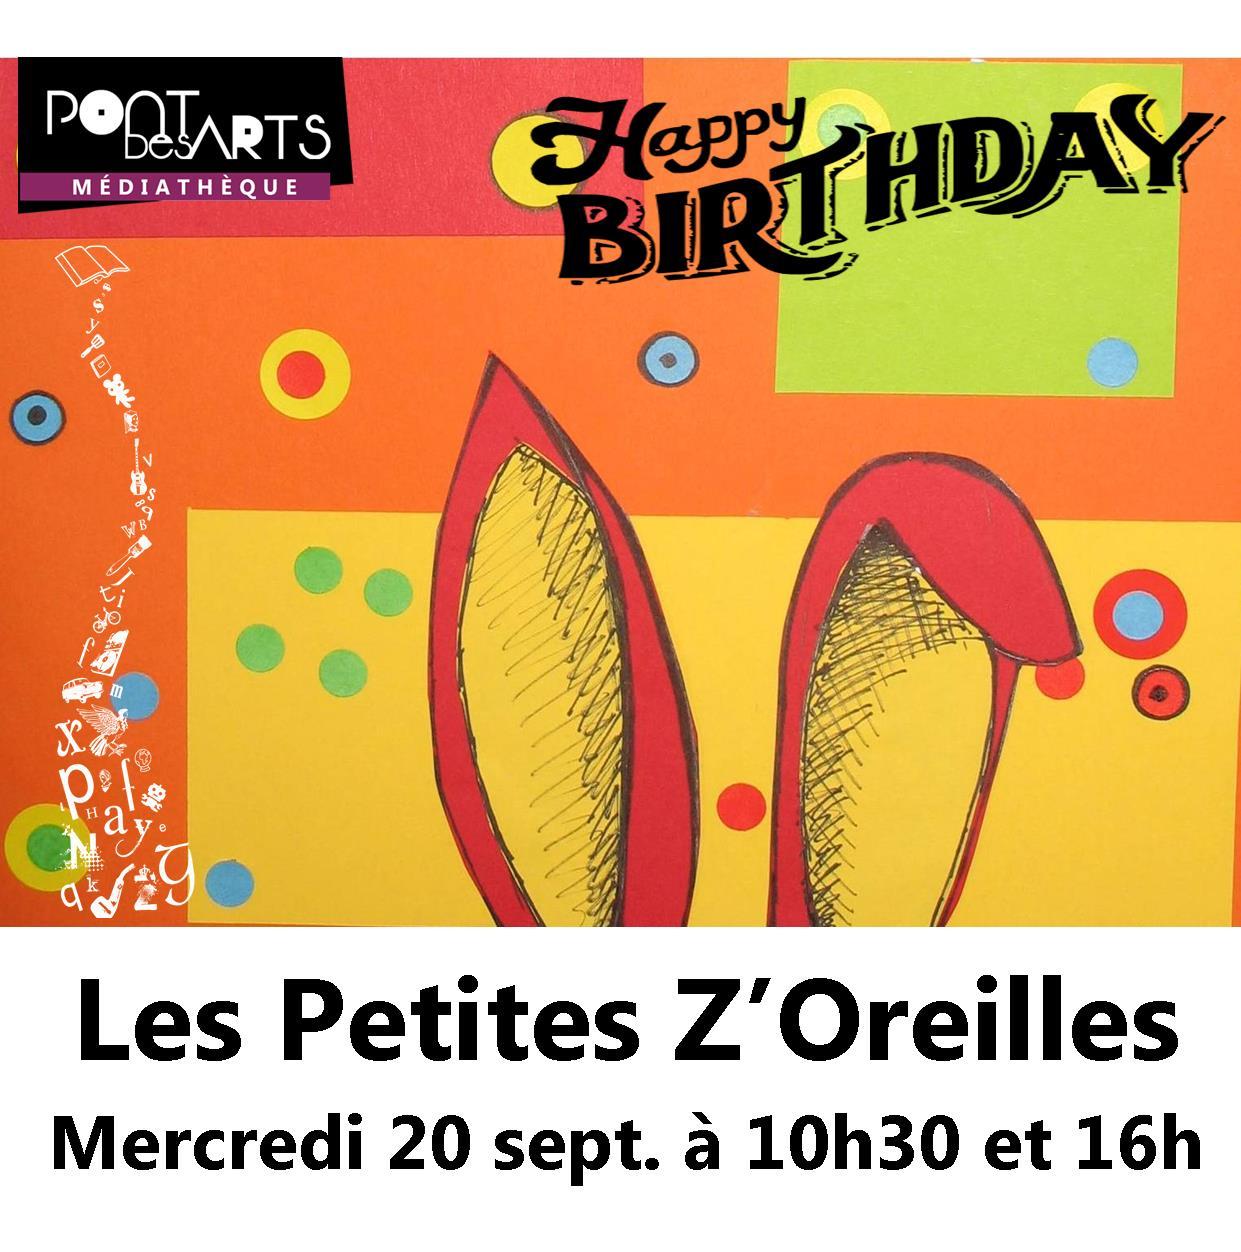 Les Petites Z'Oreilles : Happy Birthday |